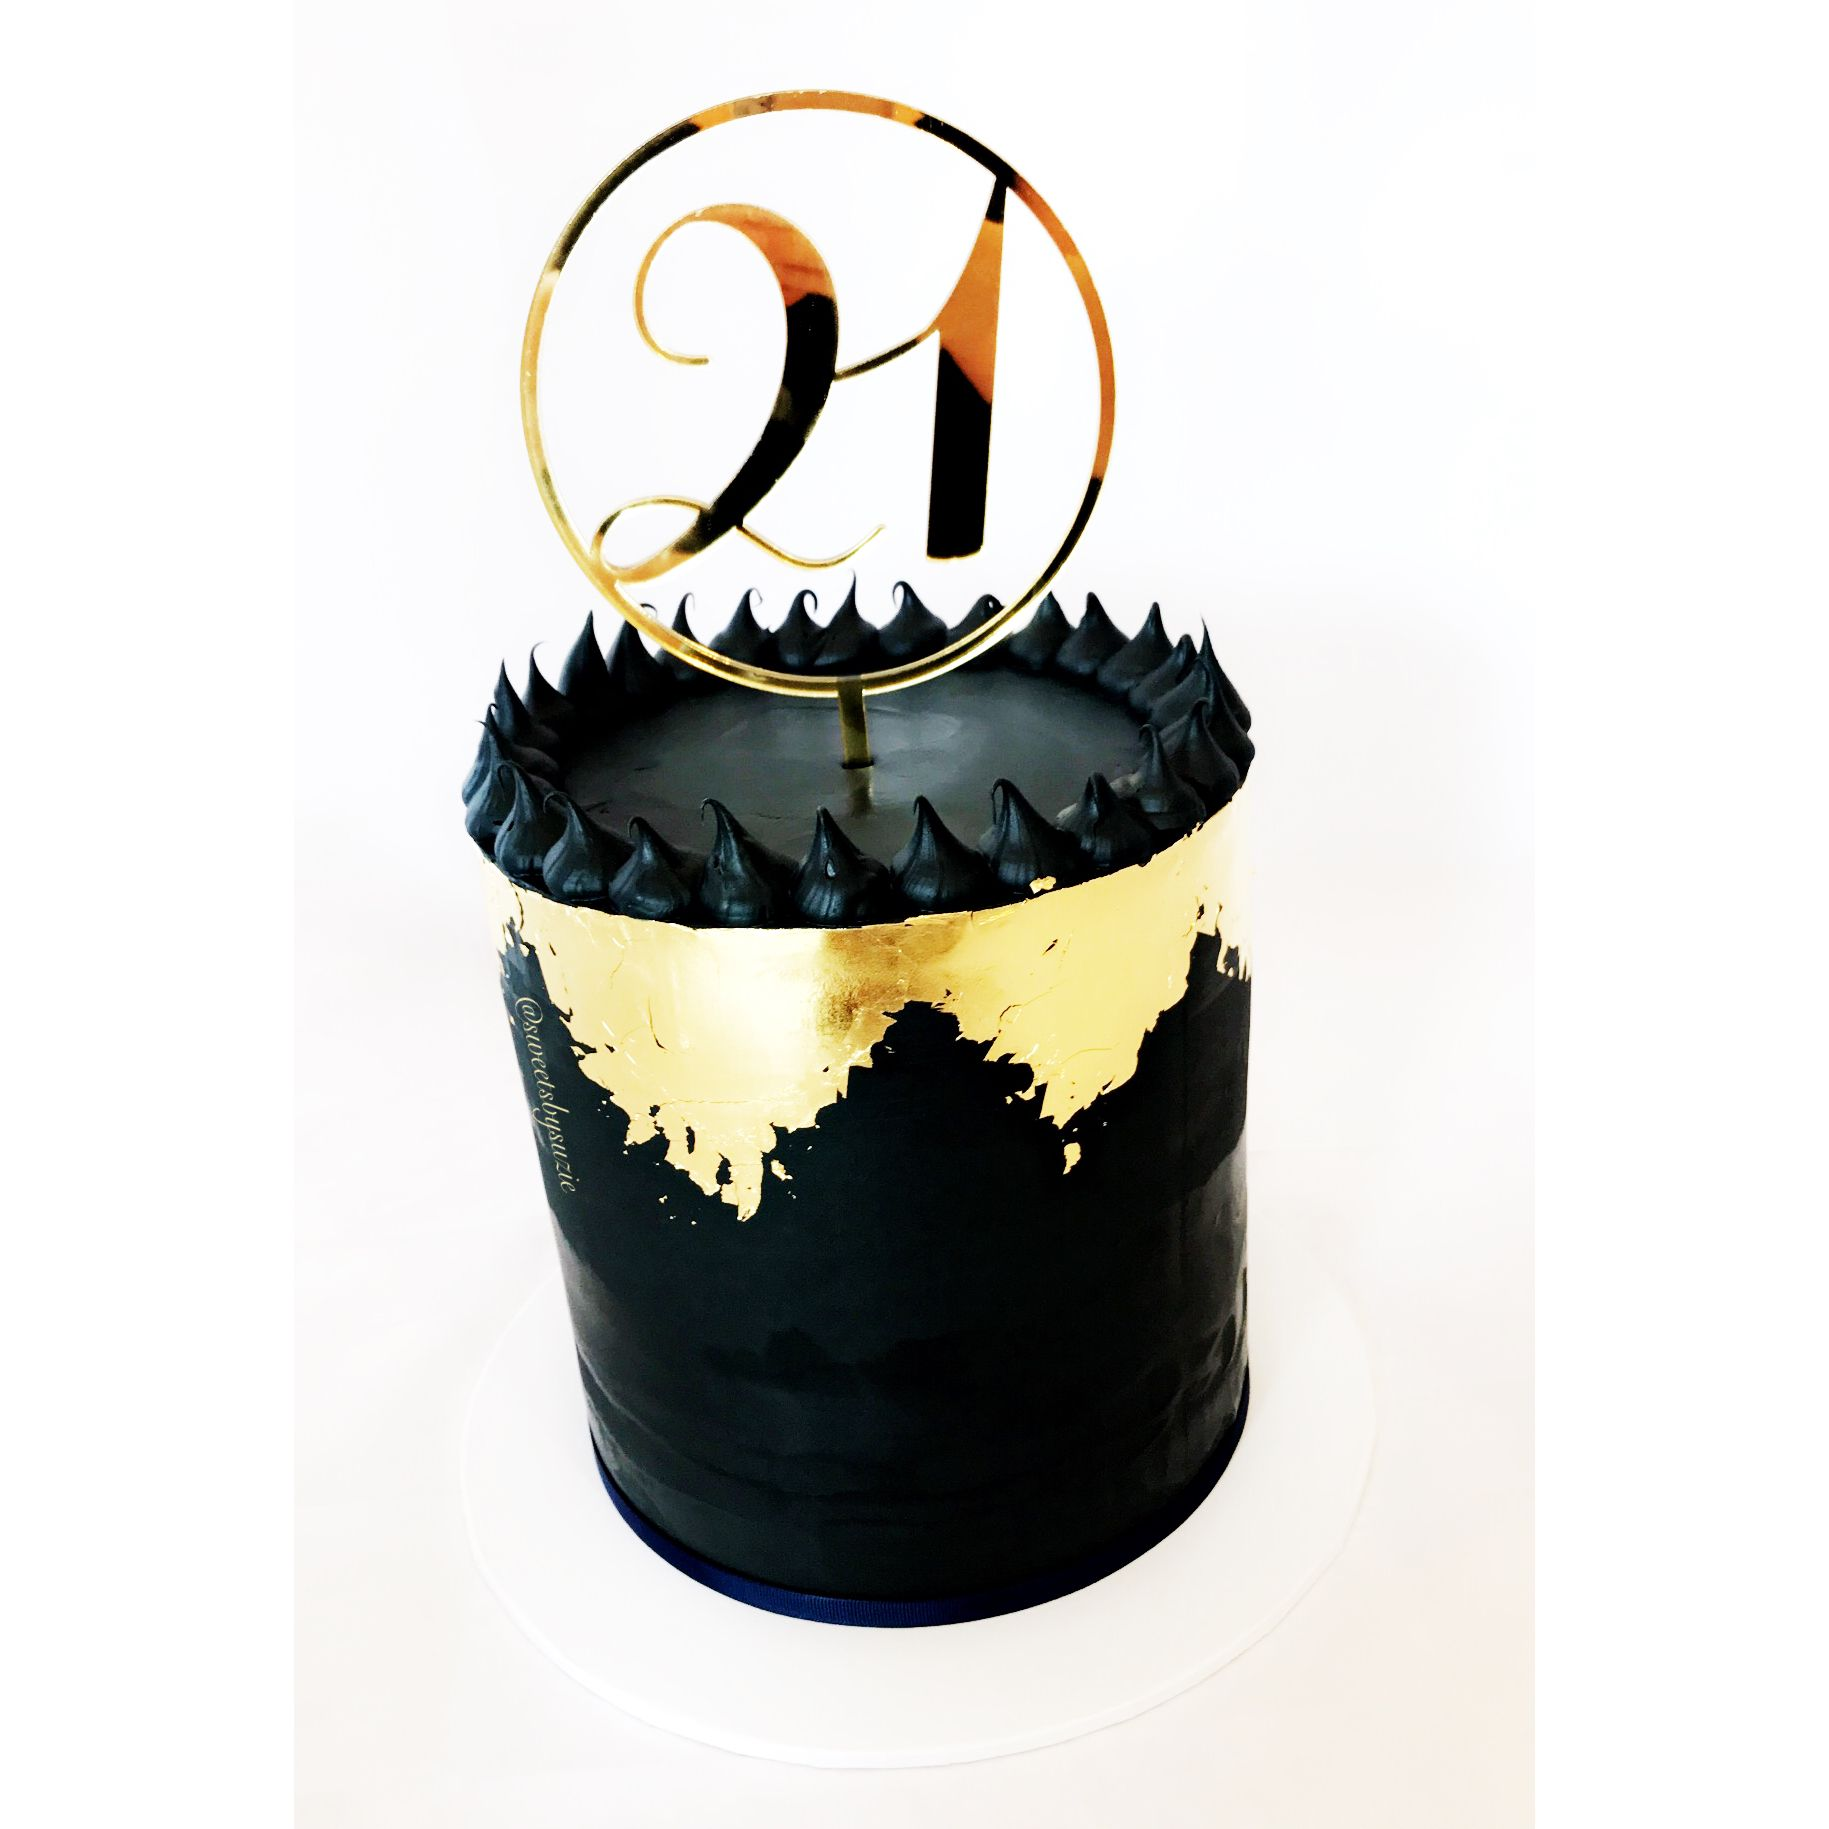 Gold leaf 21st birthday cake made by sweetsbysuzie in